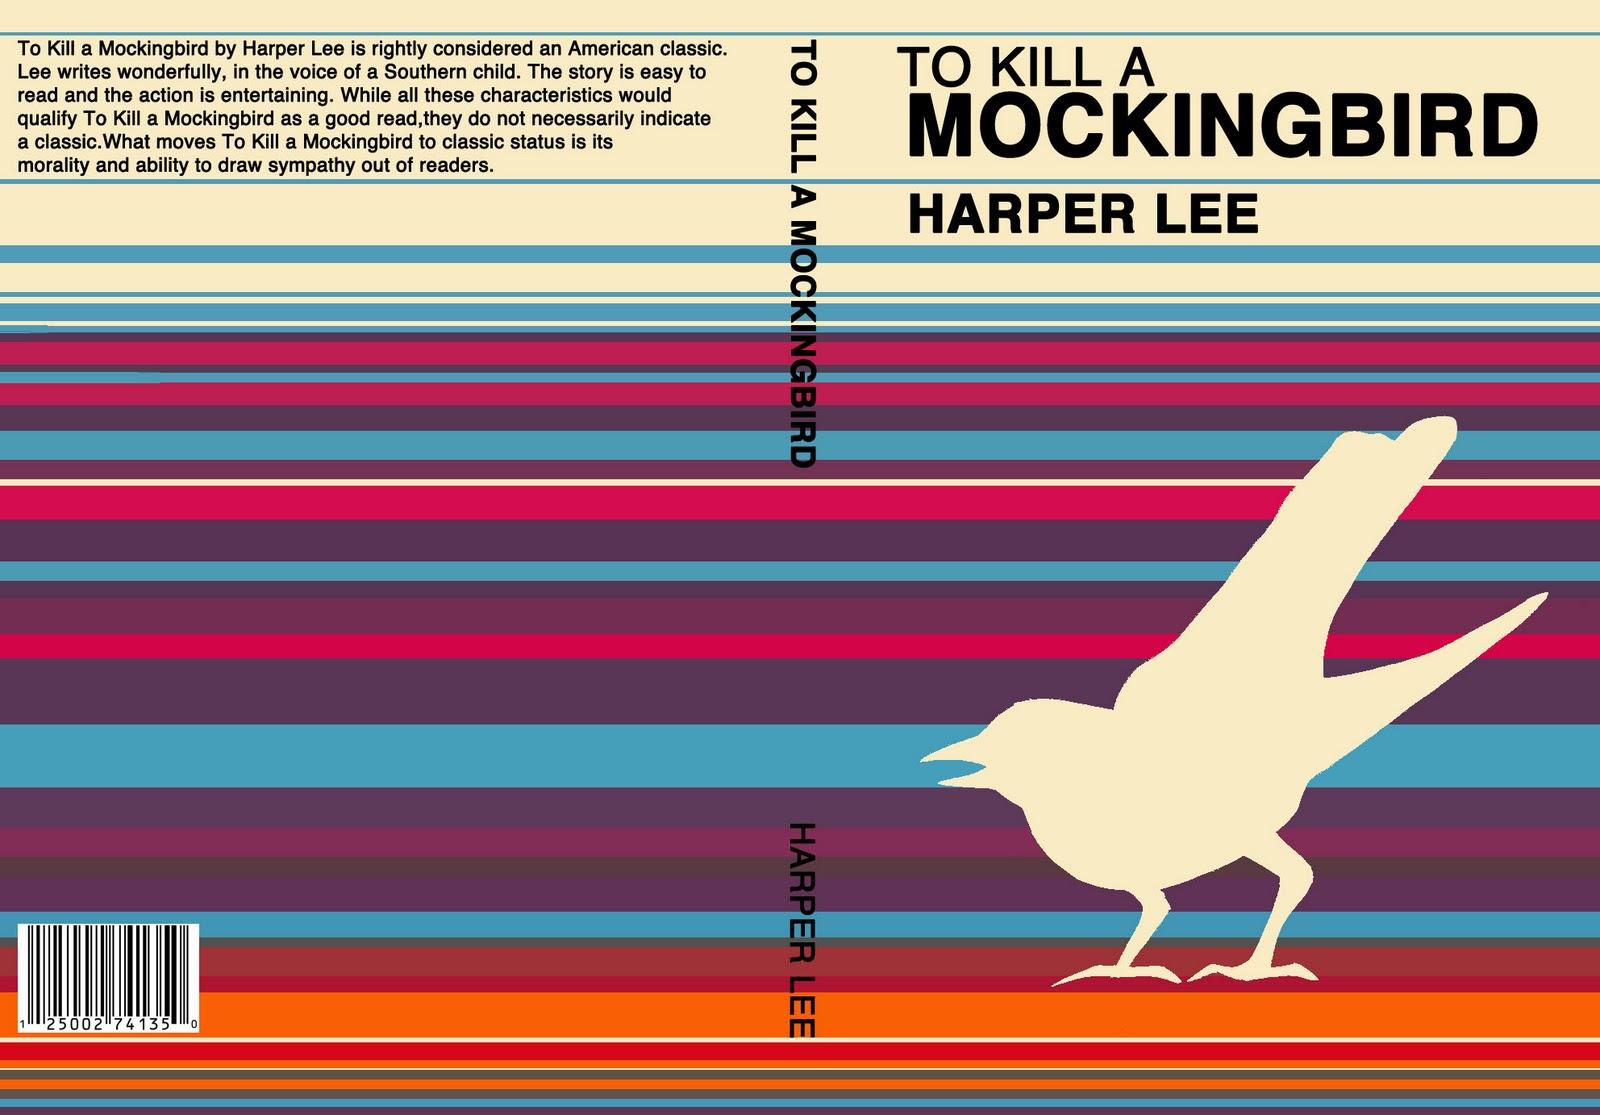 essay about to kill a mockingbird racism Huckleberry finn book report to kill a mockingbird racism essay spelling homework helper order a essay.